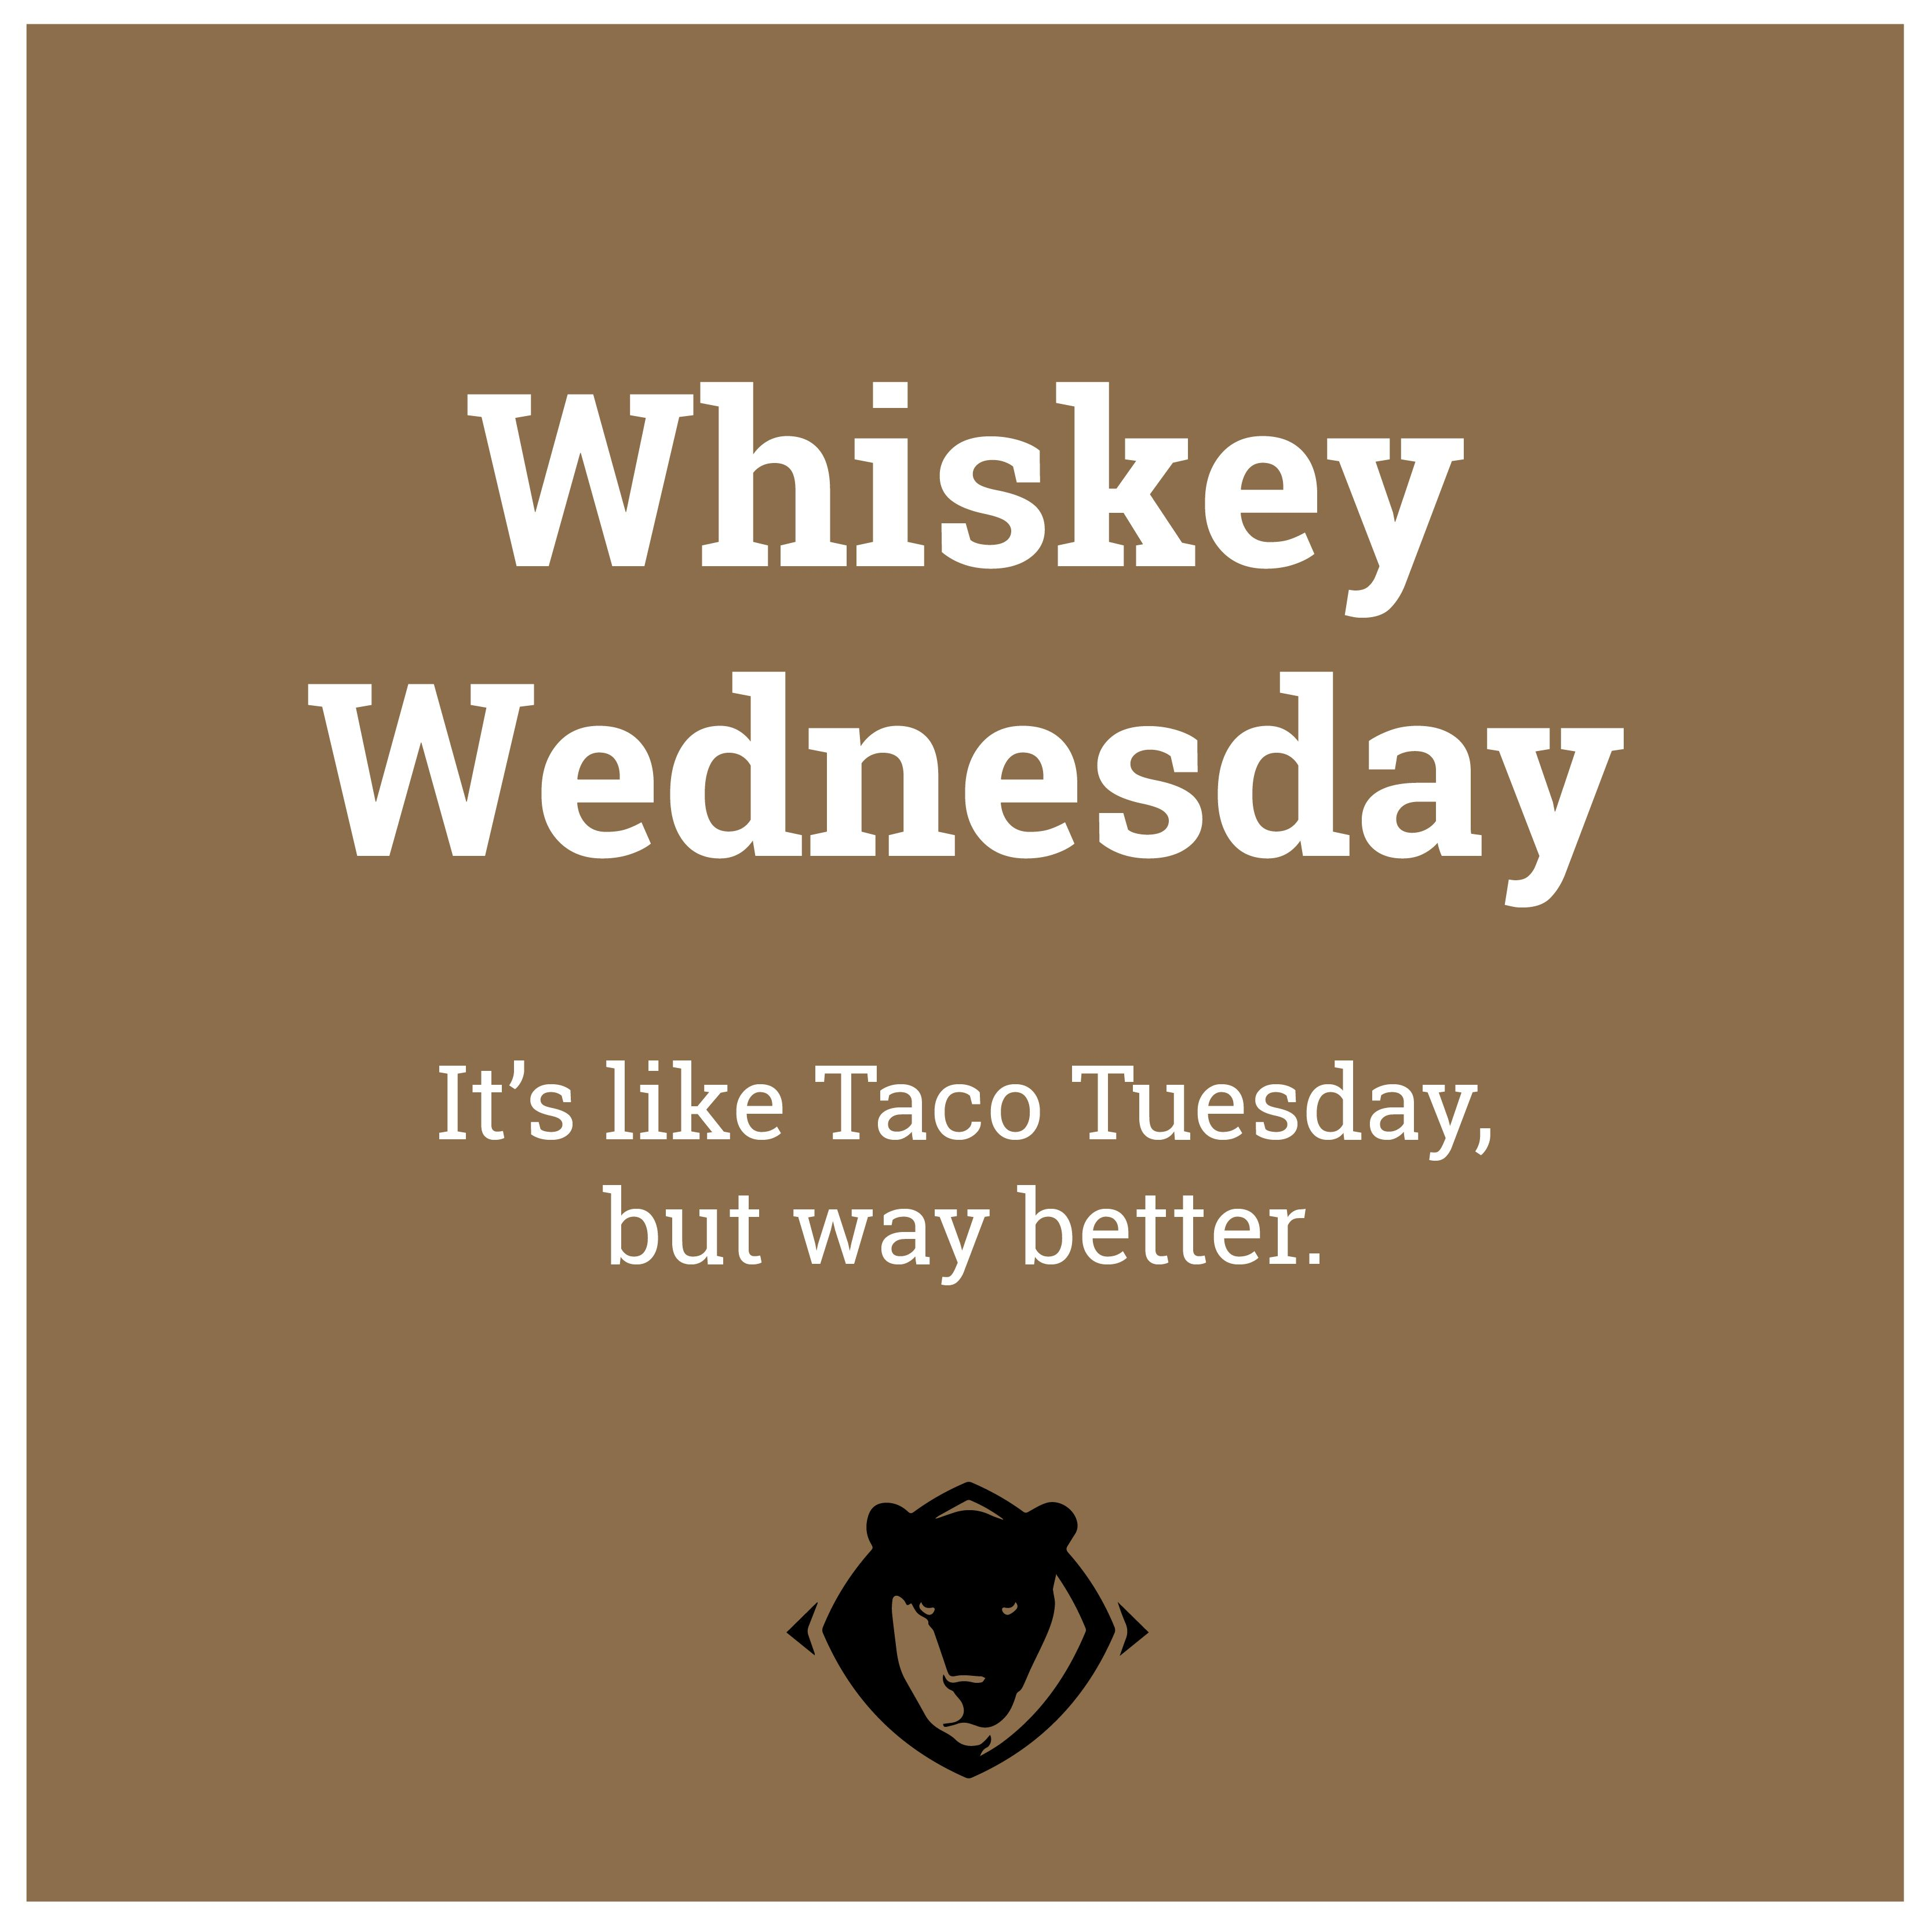 Funny Whiskey Wednesday Whiskey Bourbon Tacos Taco Tuesday